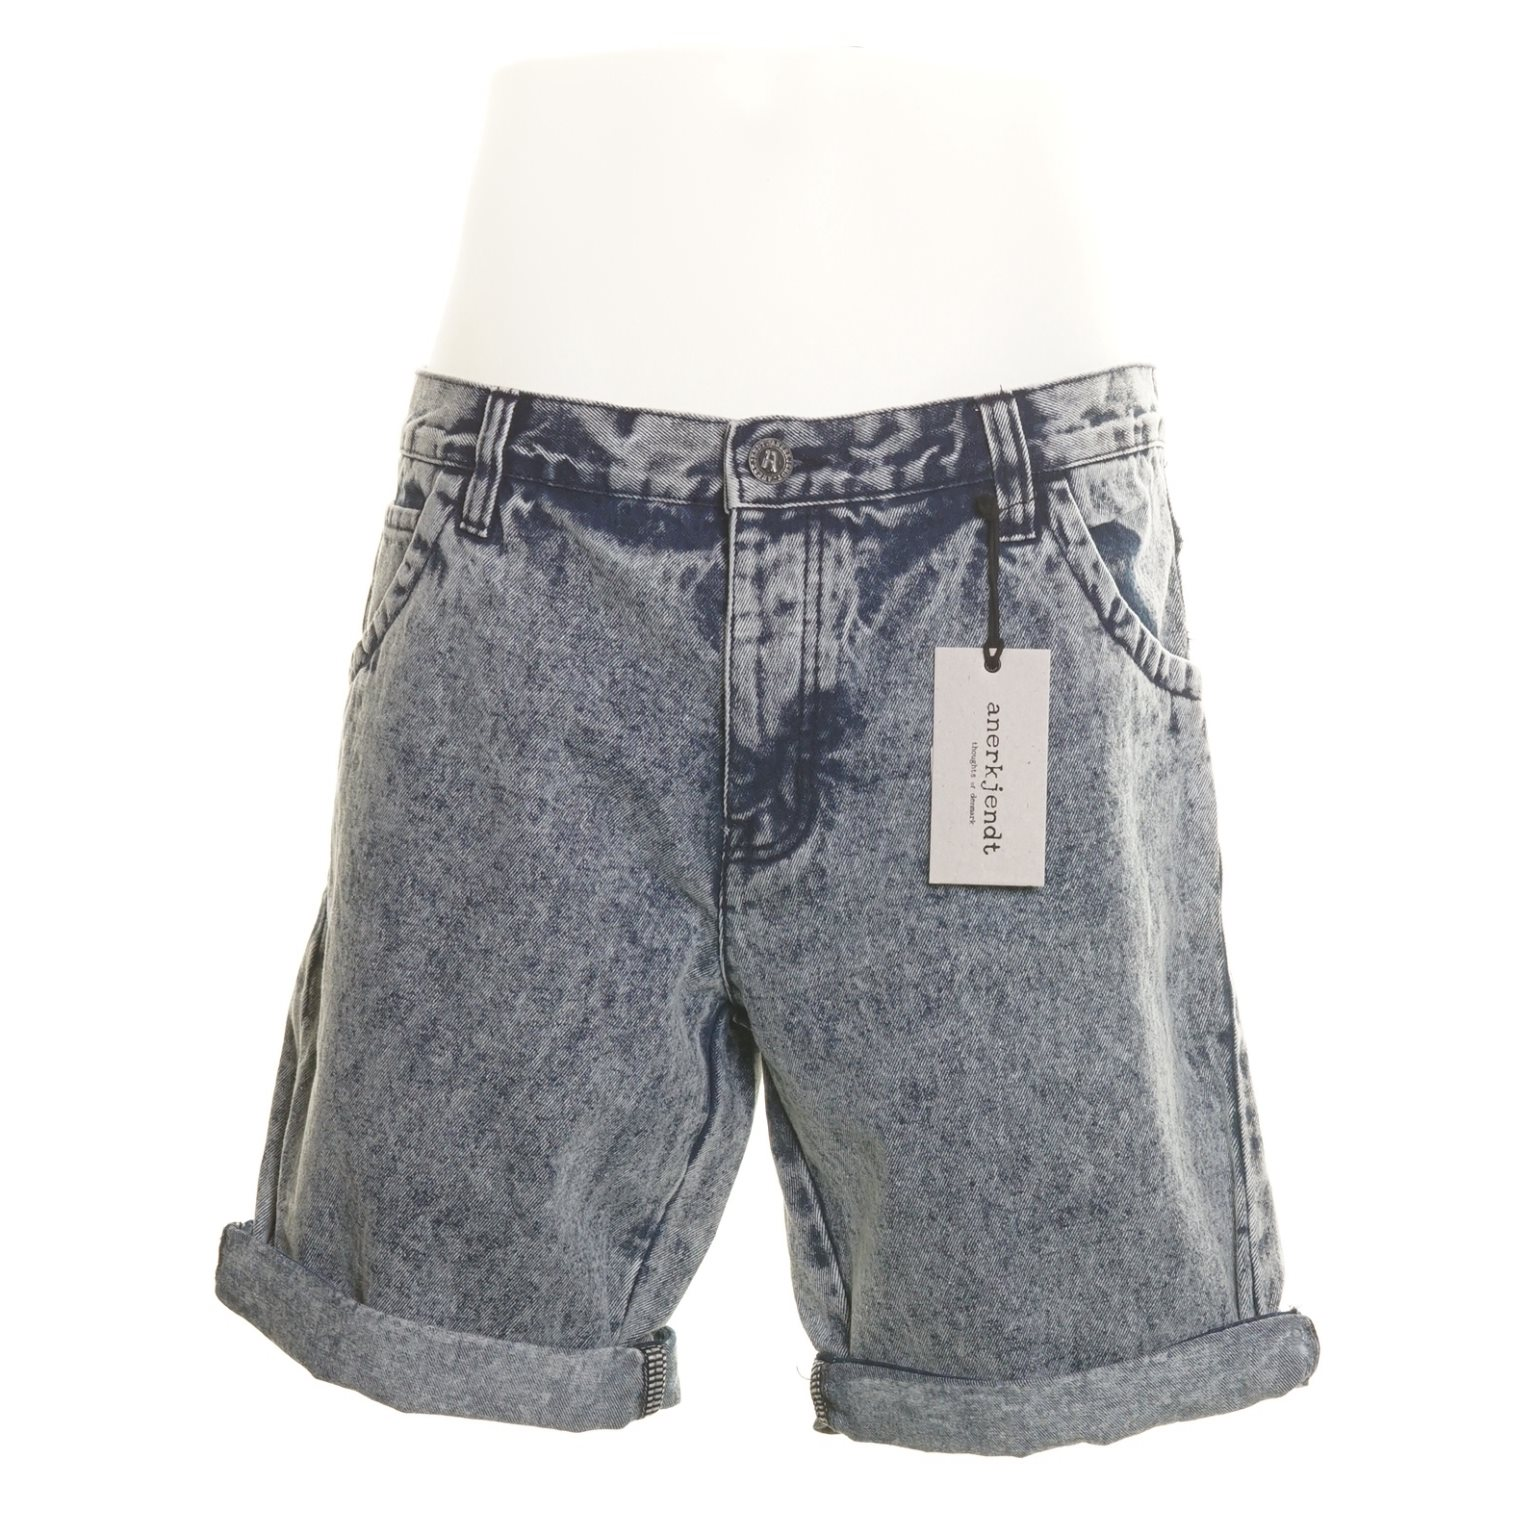 Anerkjendt, Jeansshorts, Strl: L, Mate Shorts, Ljusblå/Blå